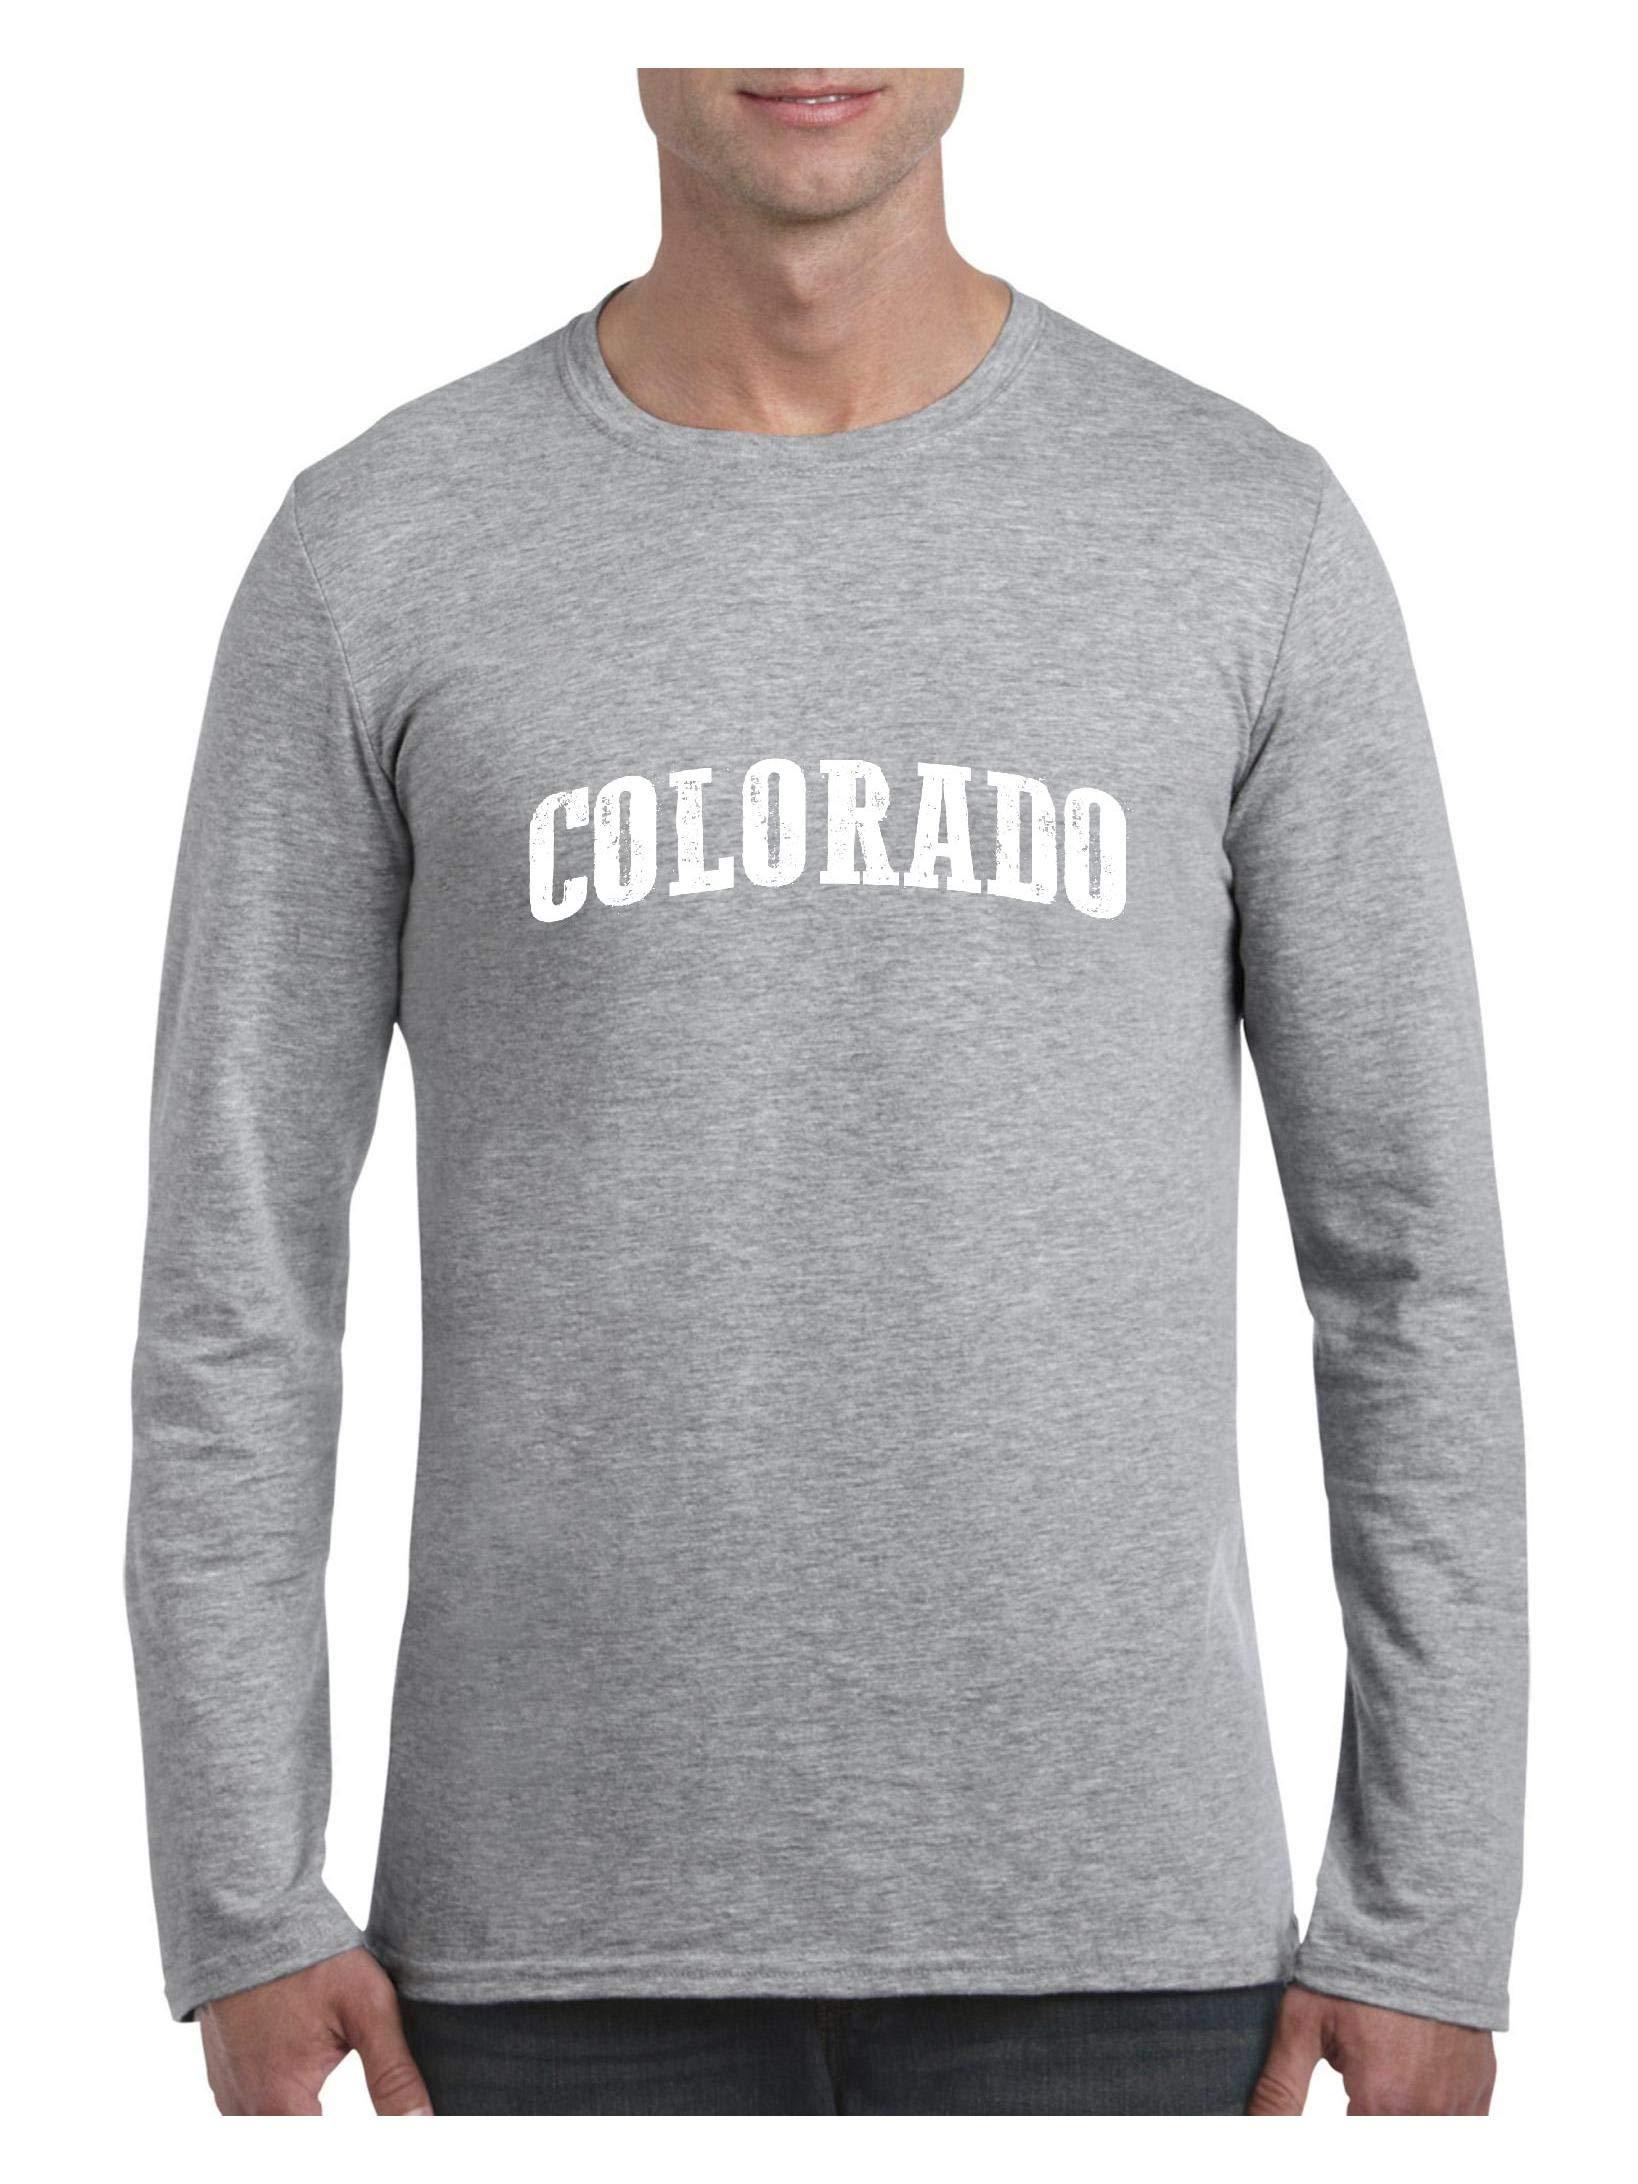 Colorado State Flag Traveler S Gift Softsyle T Shirt 7837